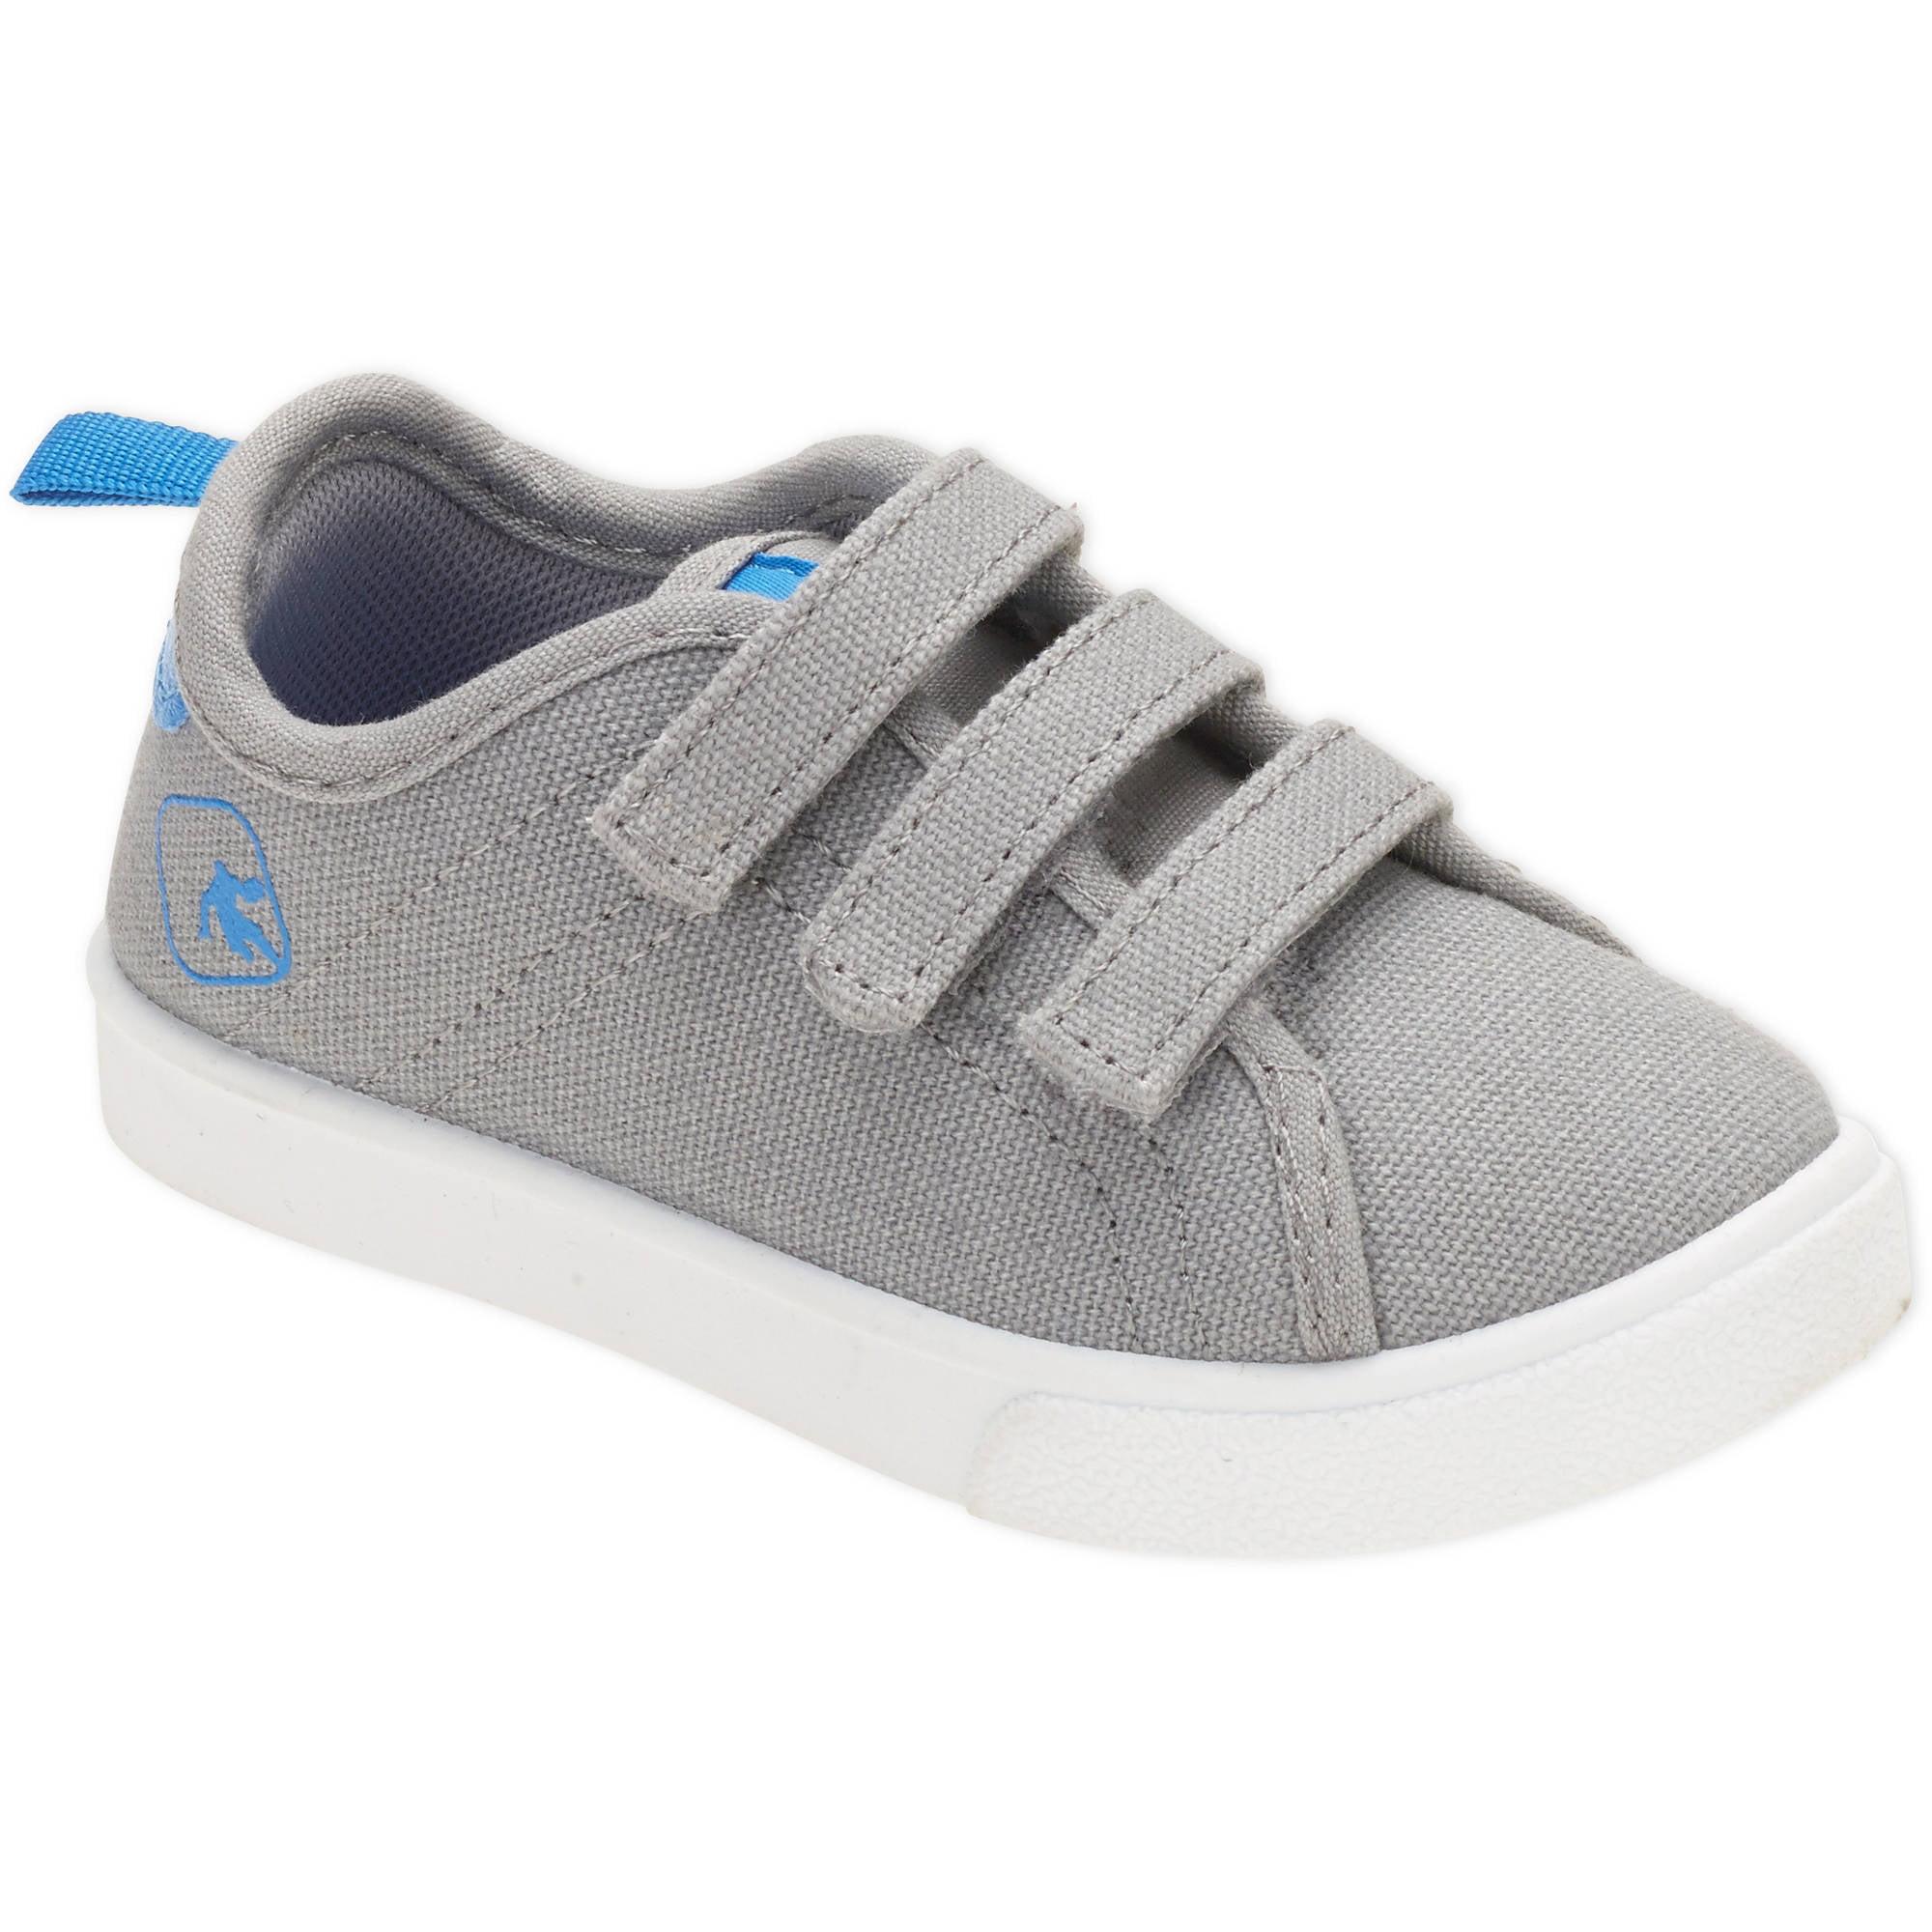 Skate shoes walmart - Skate Shoes Walmart 25